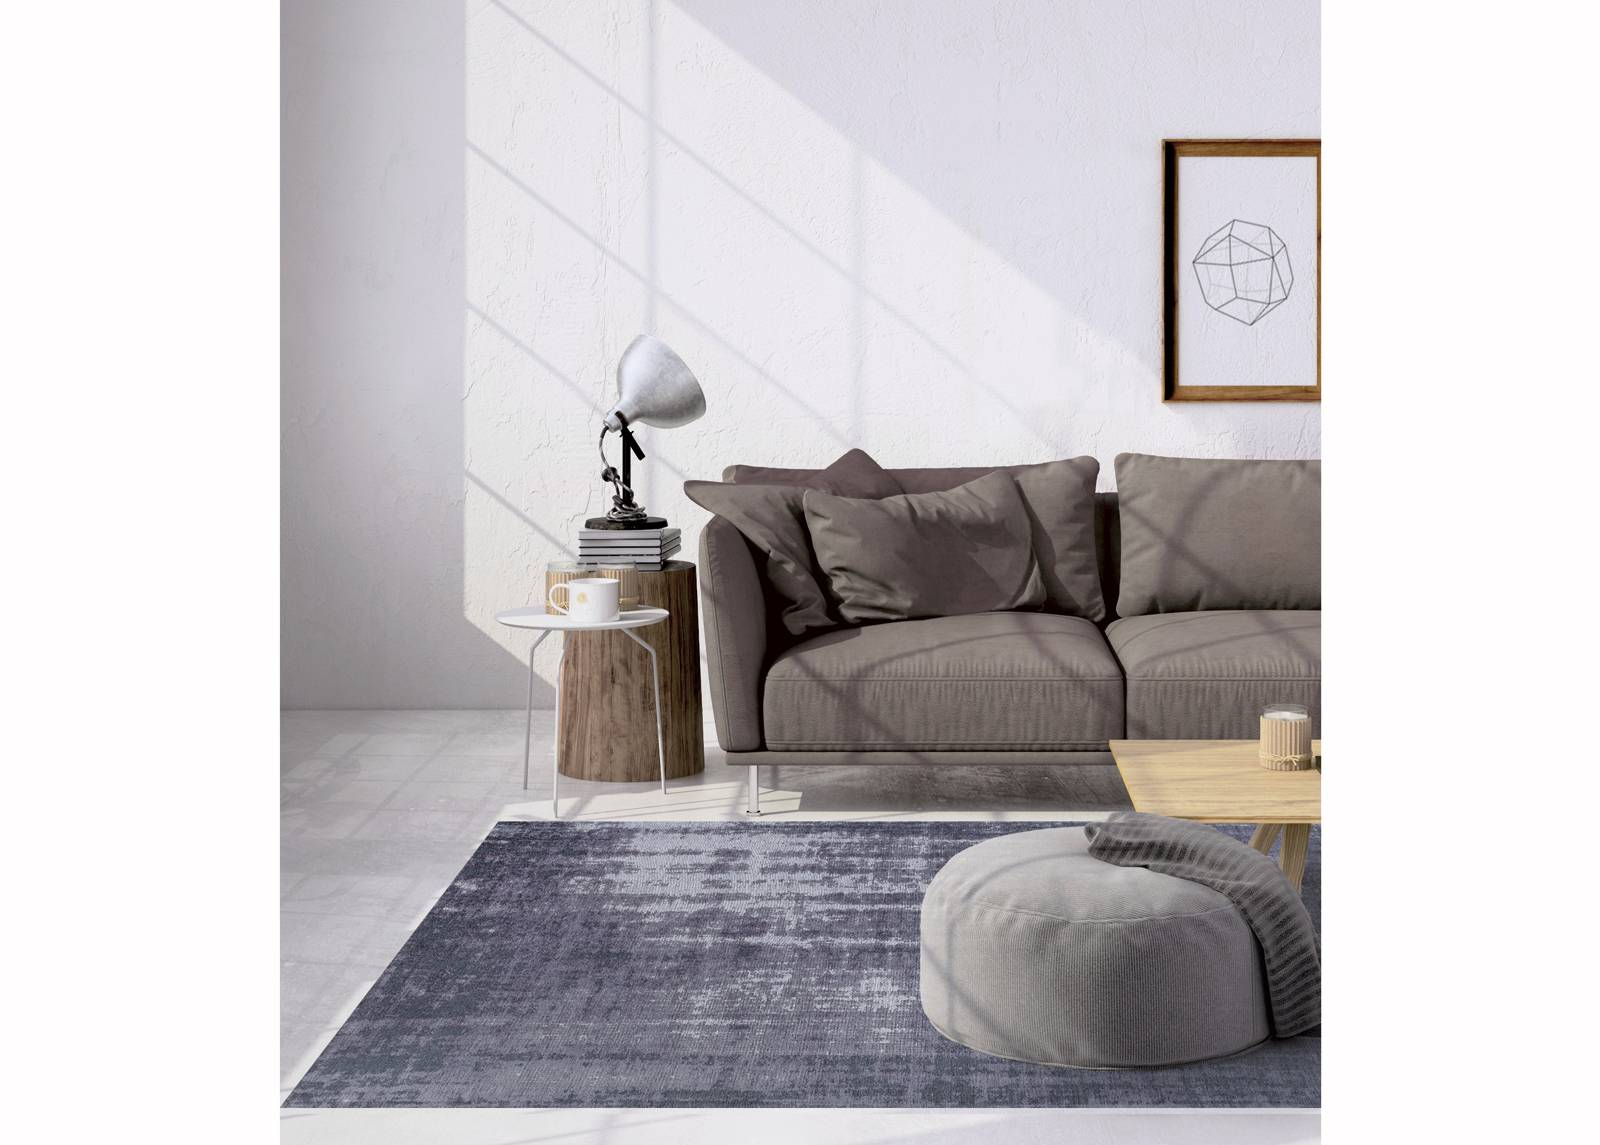 Magic home matto SOIL 160x230 cm